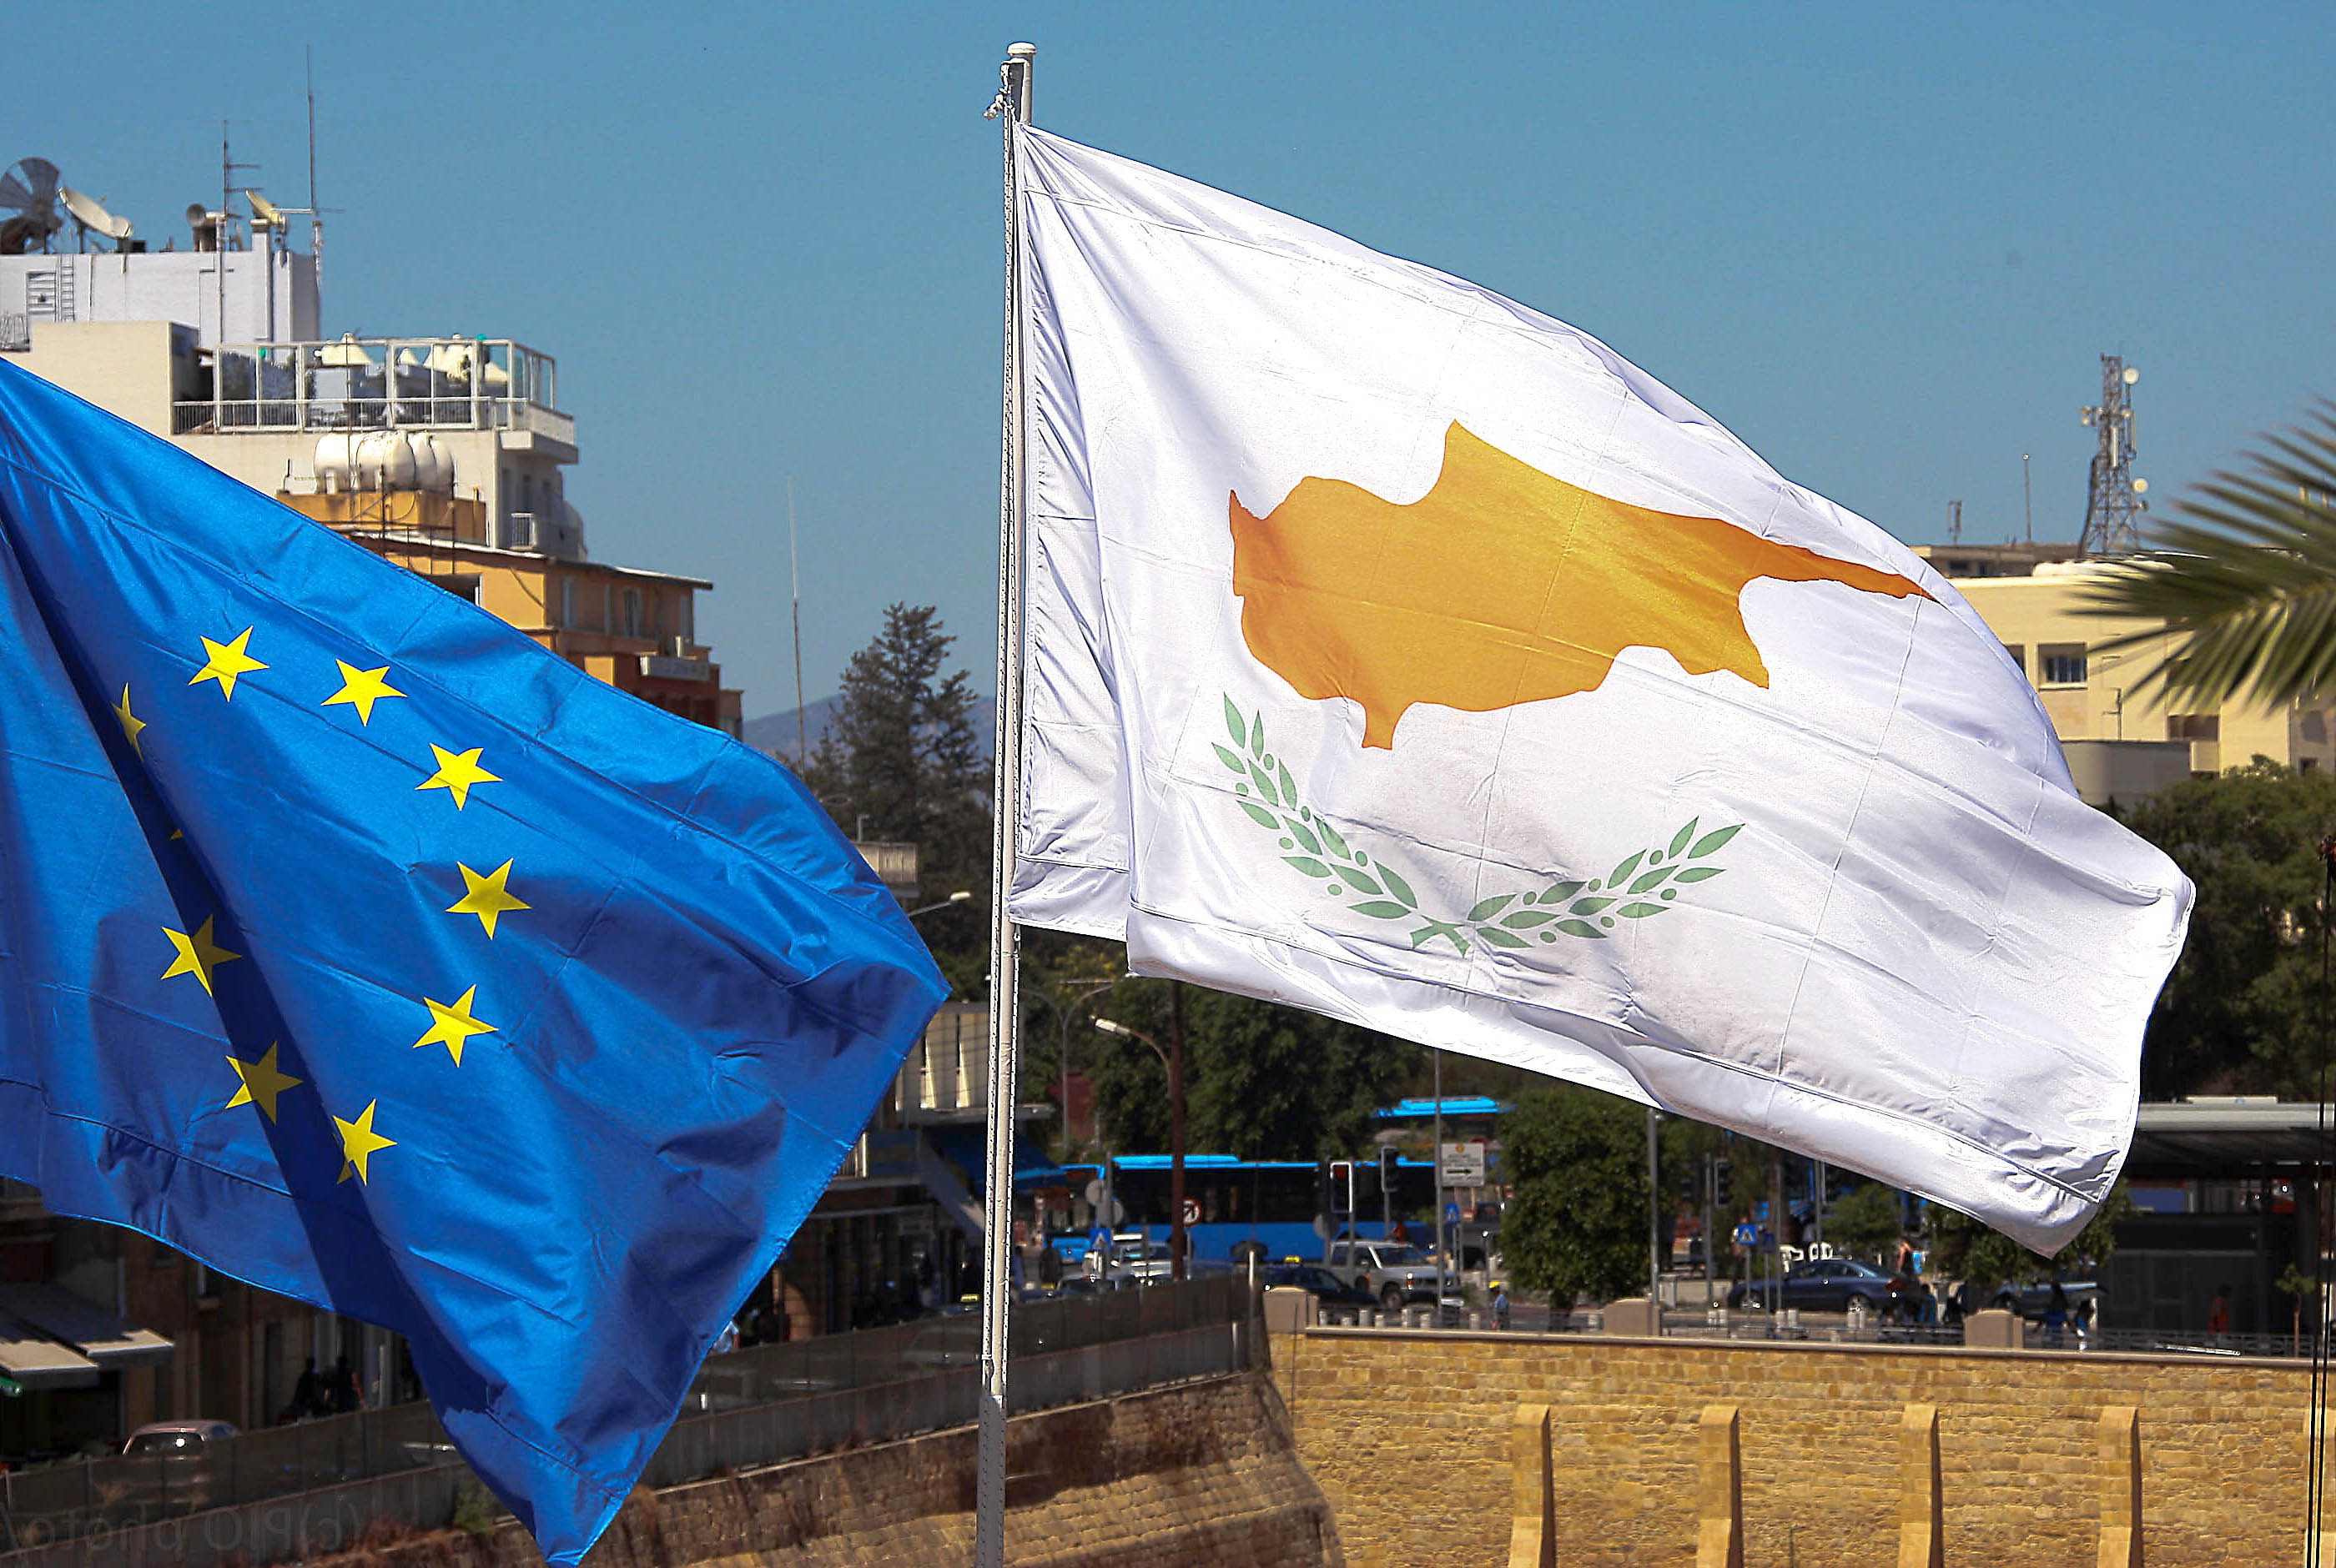 Кипр - член Евросоюза